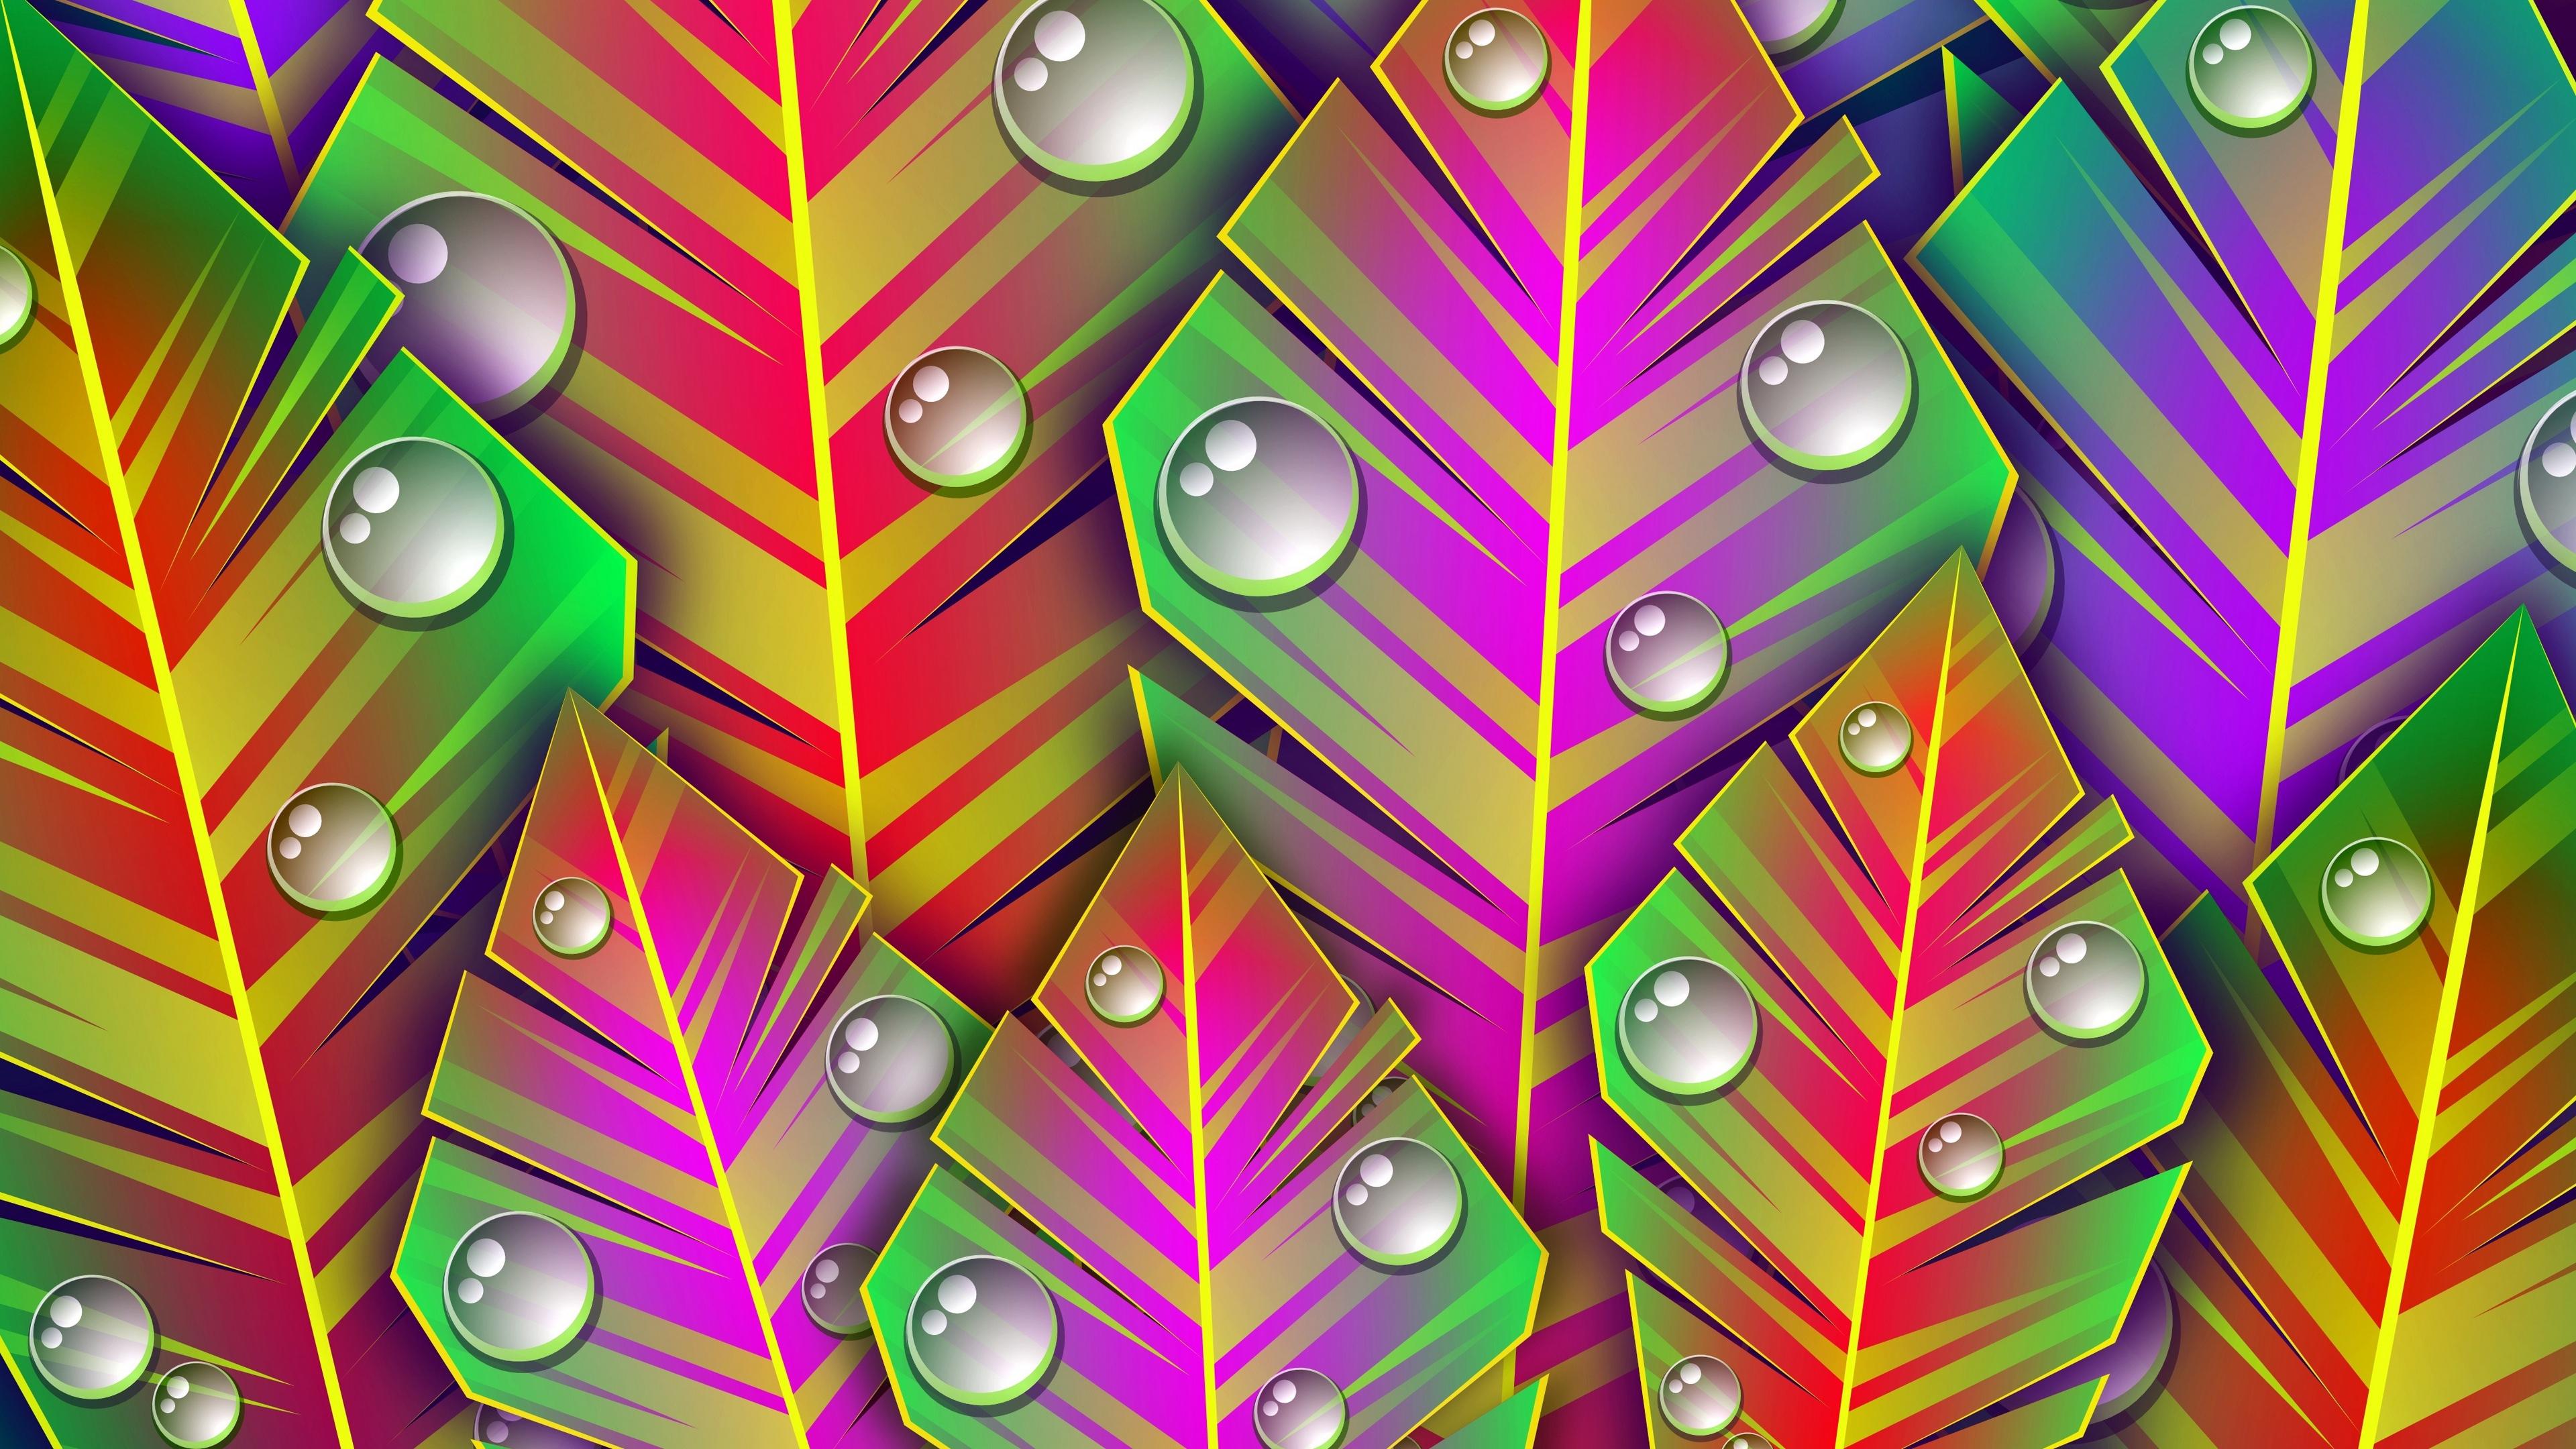 leaves dew art bright lines patterns 4k 1539369698 - leaves, dew, art, bright, lines, patterns 4k - Leaves, dew, art